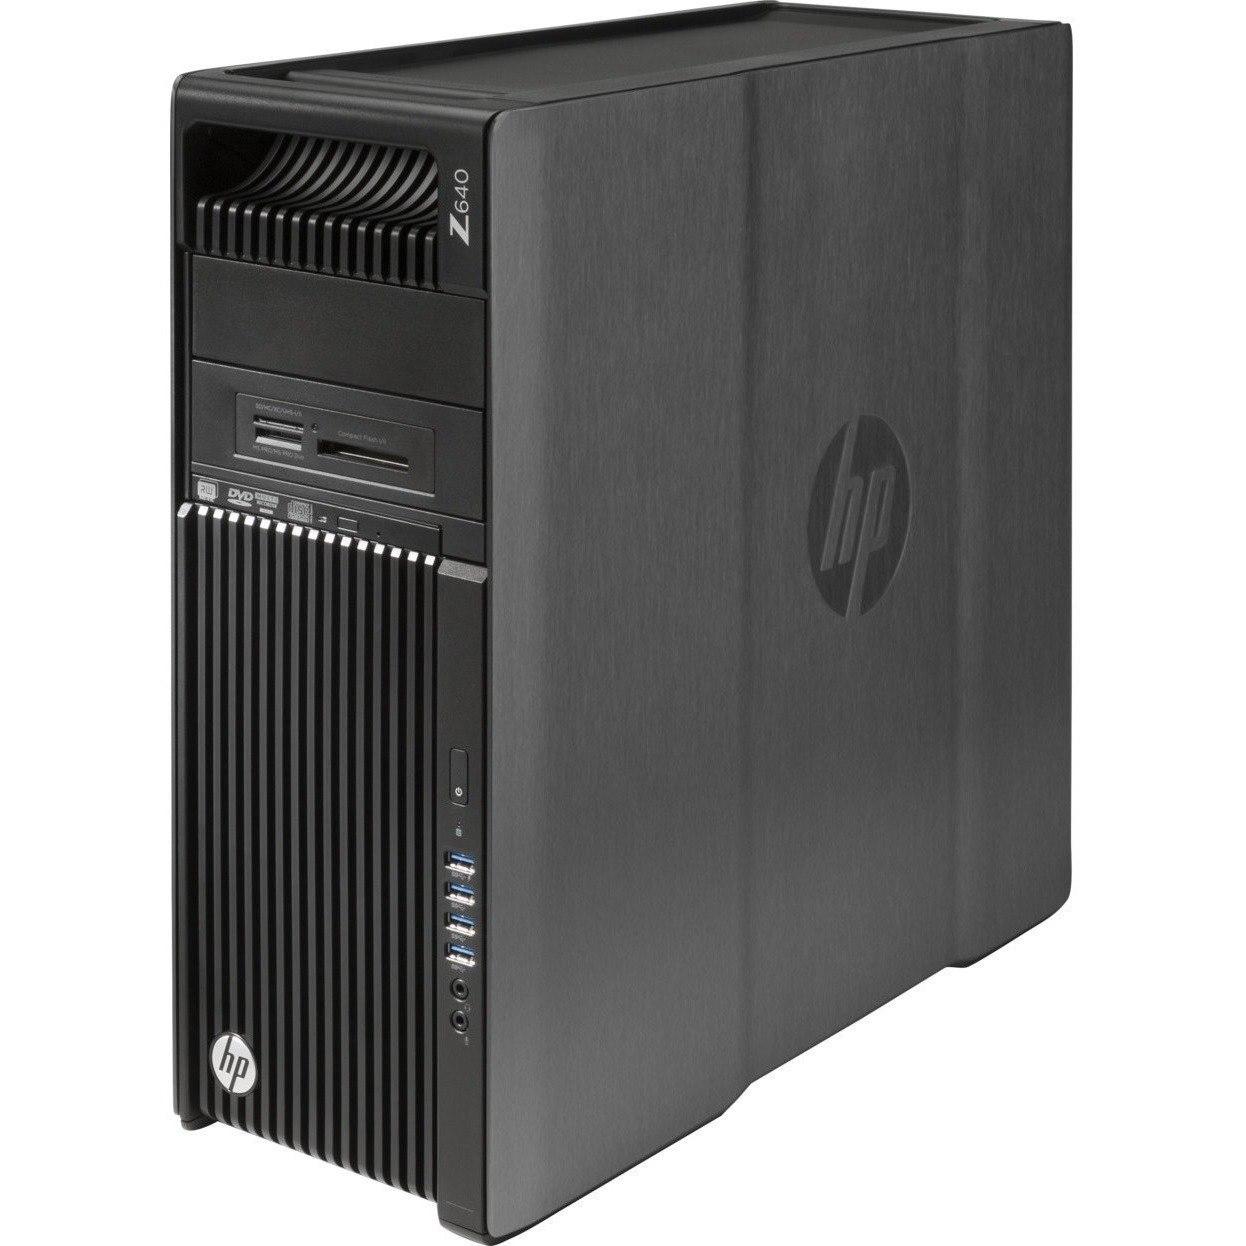 HP Z640 Workstation - 1 x Xeon E5-2650 v4 - 16 GB RAM - 256 GB SSD - Tower